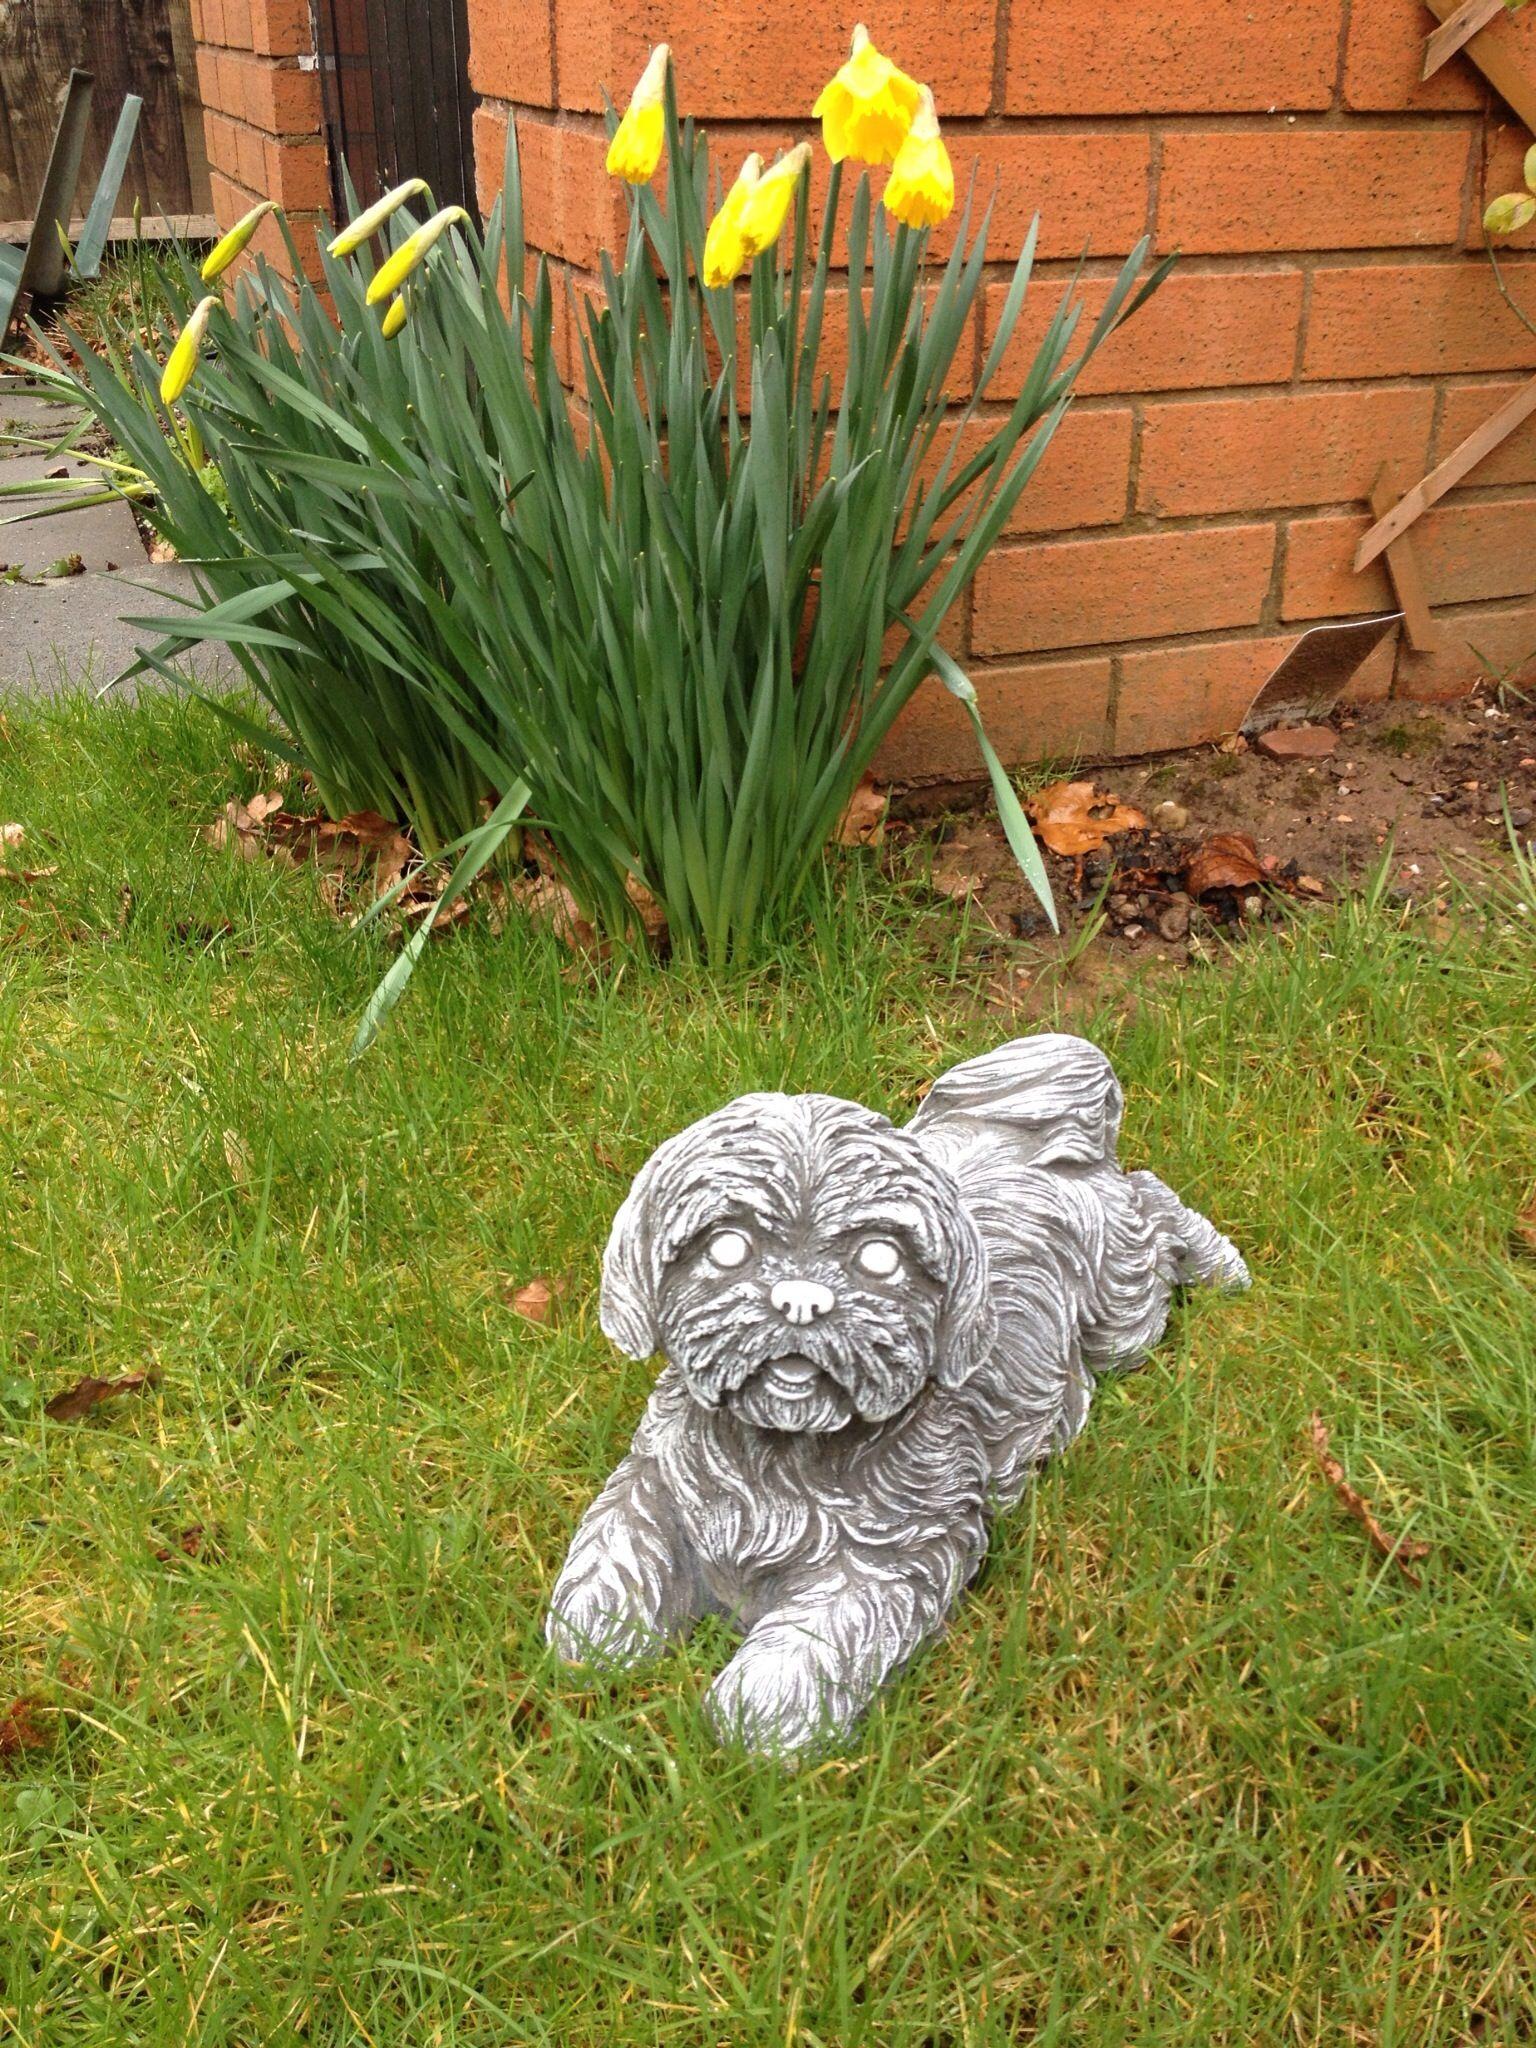 Shih Tzu Garden Statue Google Search Yard Ornaments Dog Supplies Fur Babies